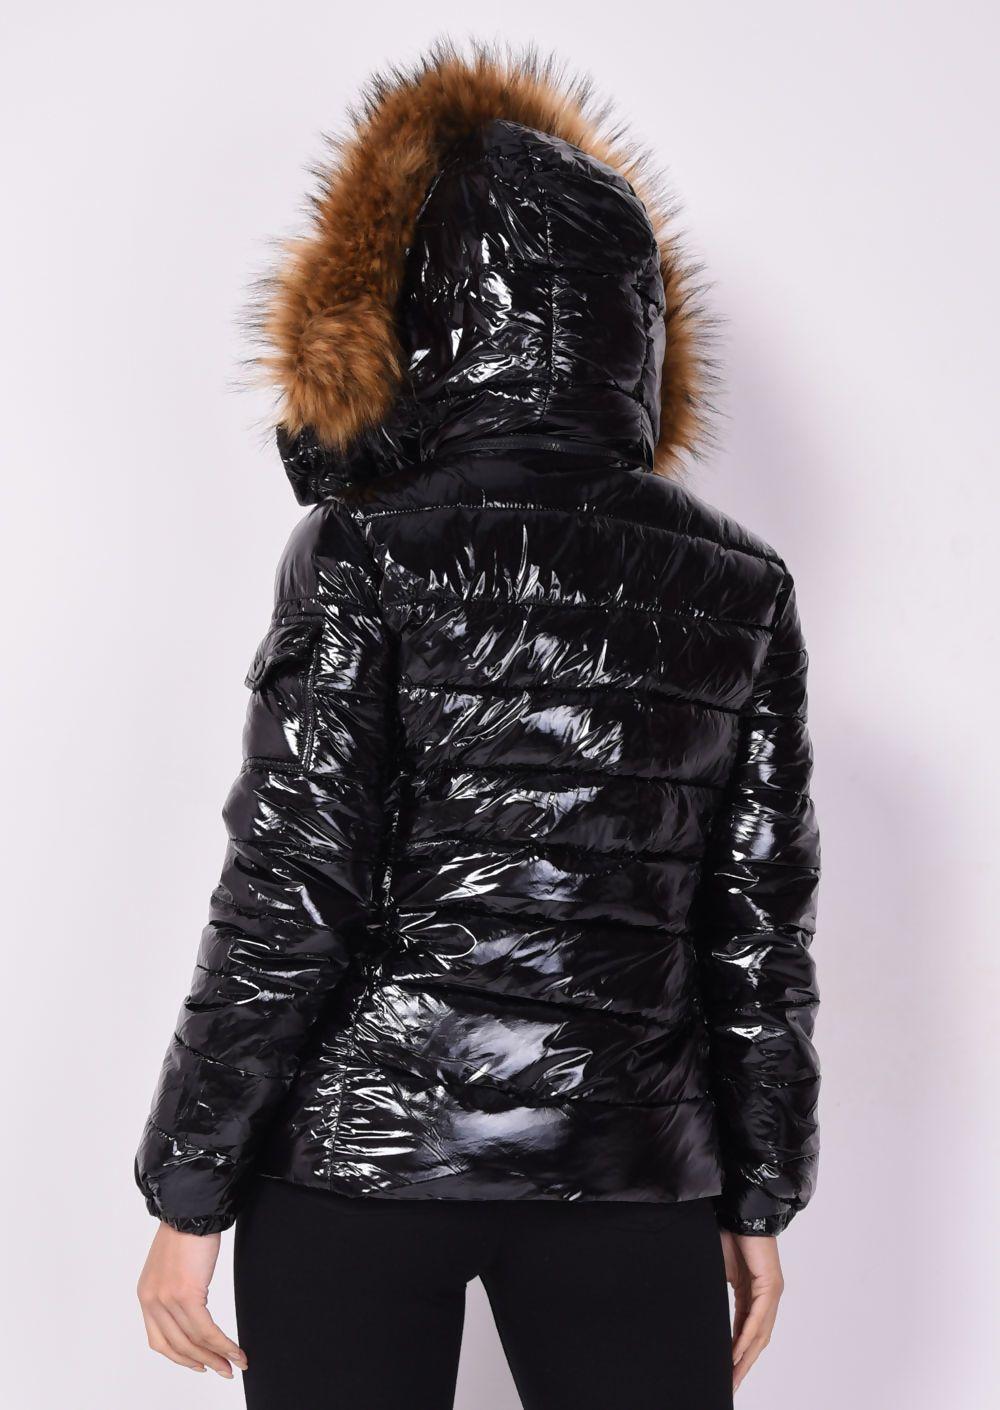 Wetlook Chunky Faux Fur Hooded Puffer Coat Black | Lily Lulu